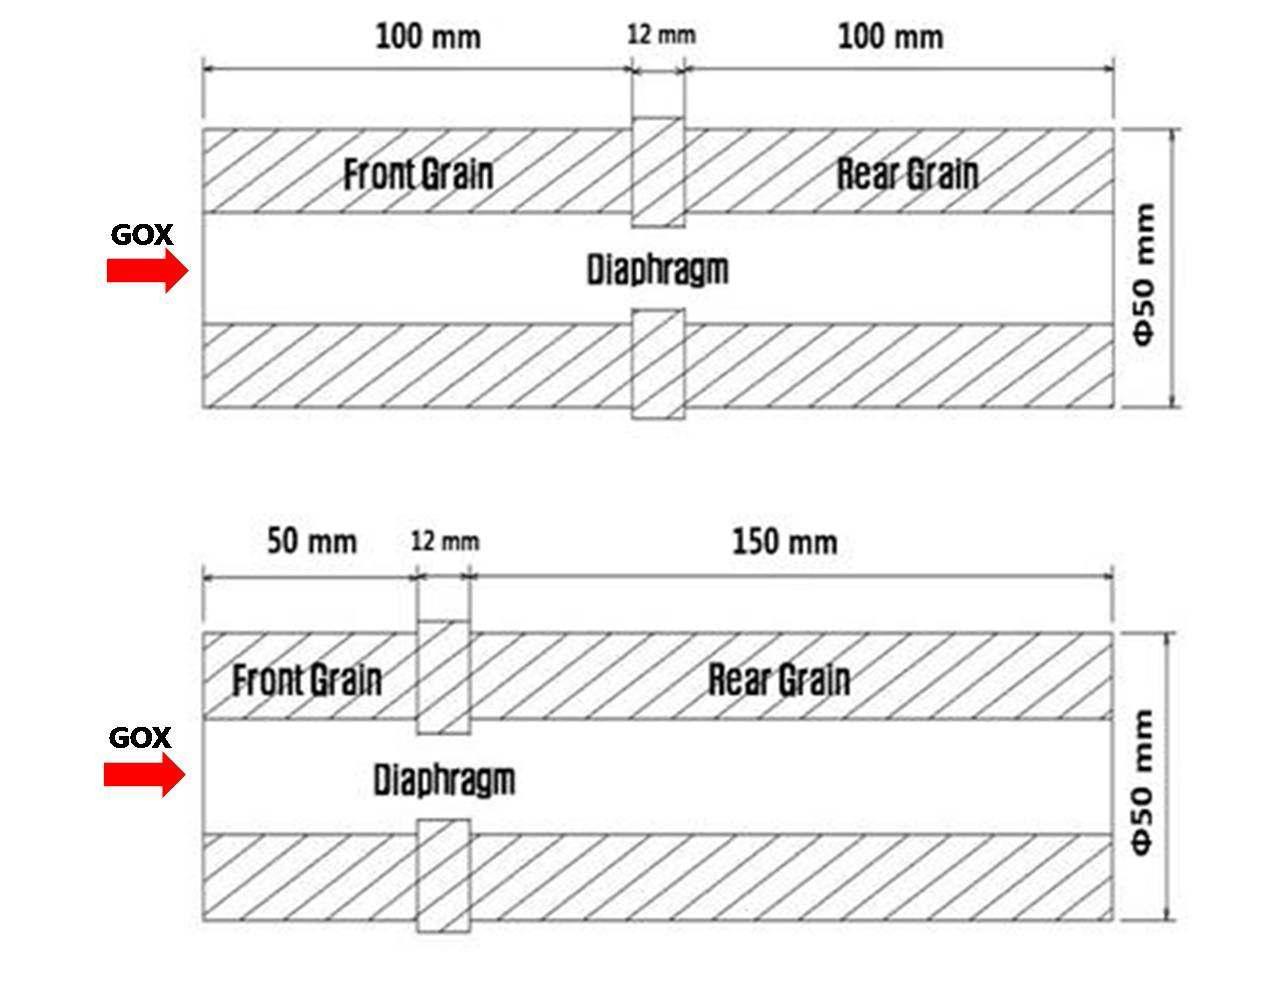 Configuration of Fuel Grain and Diaphragm Position